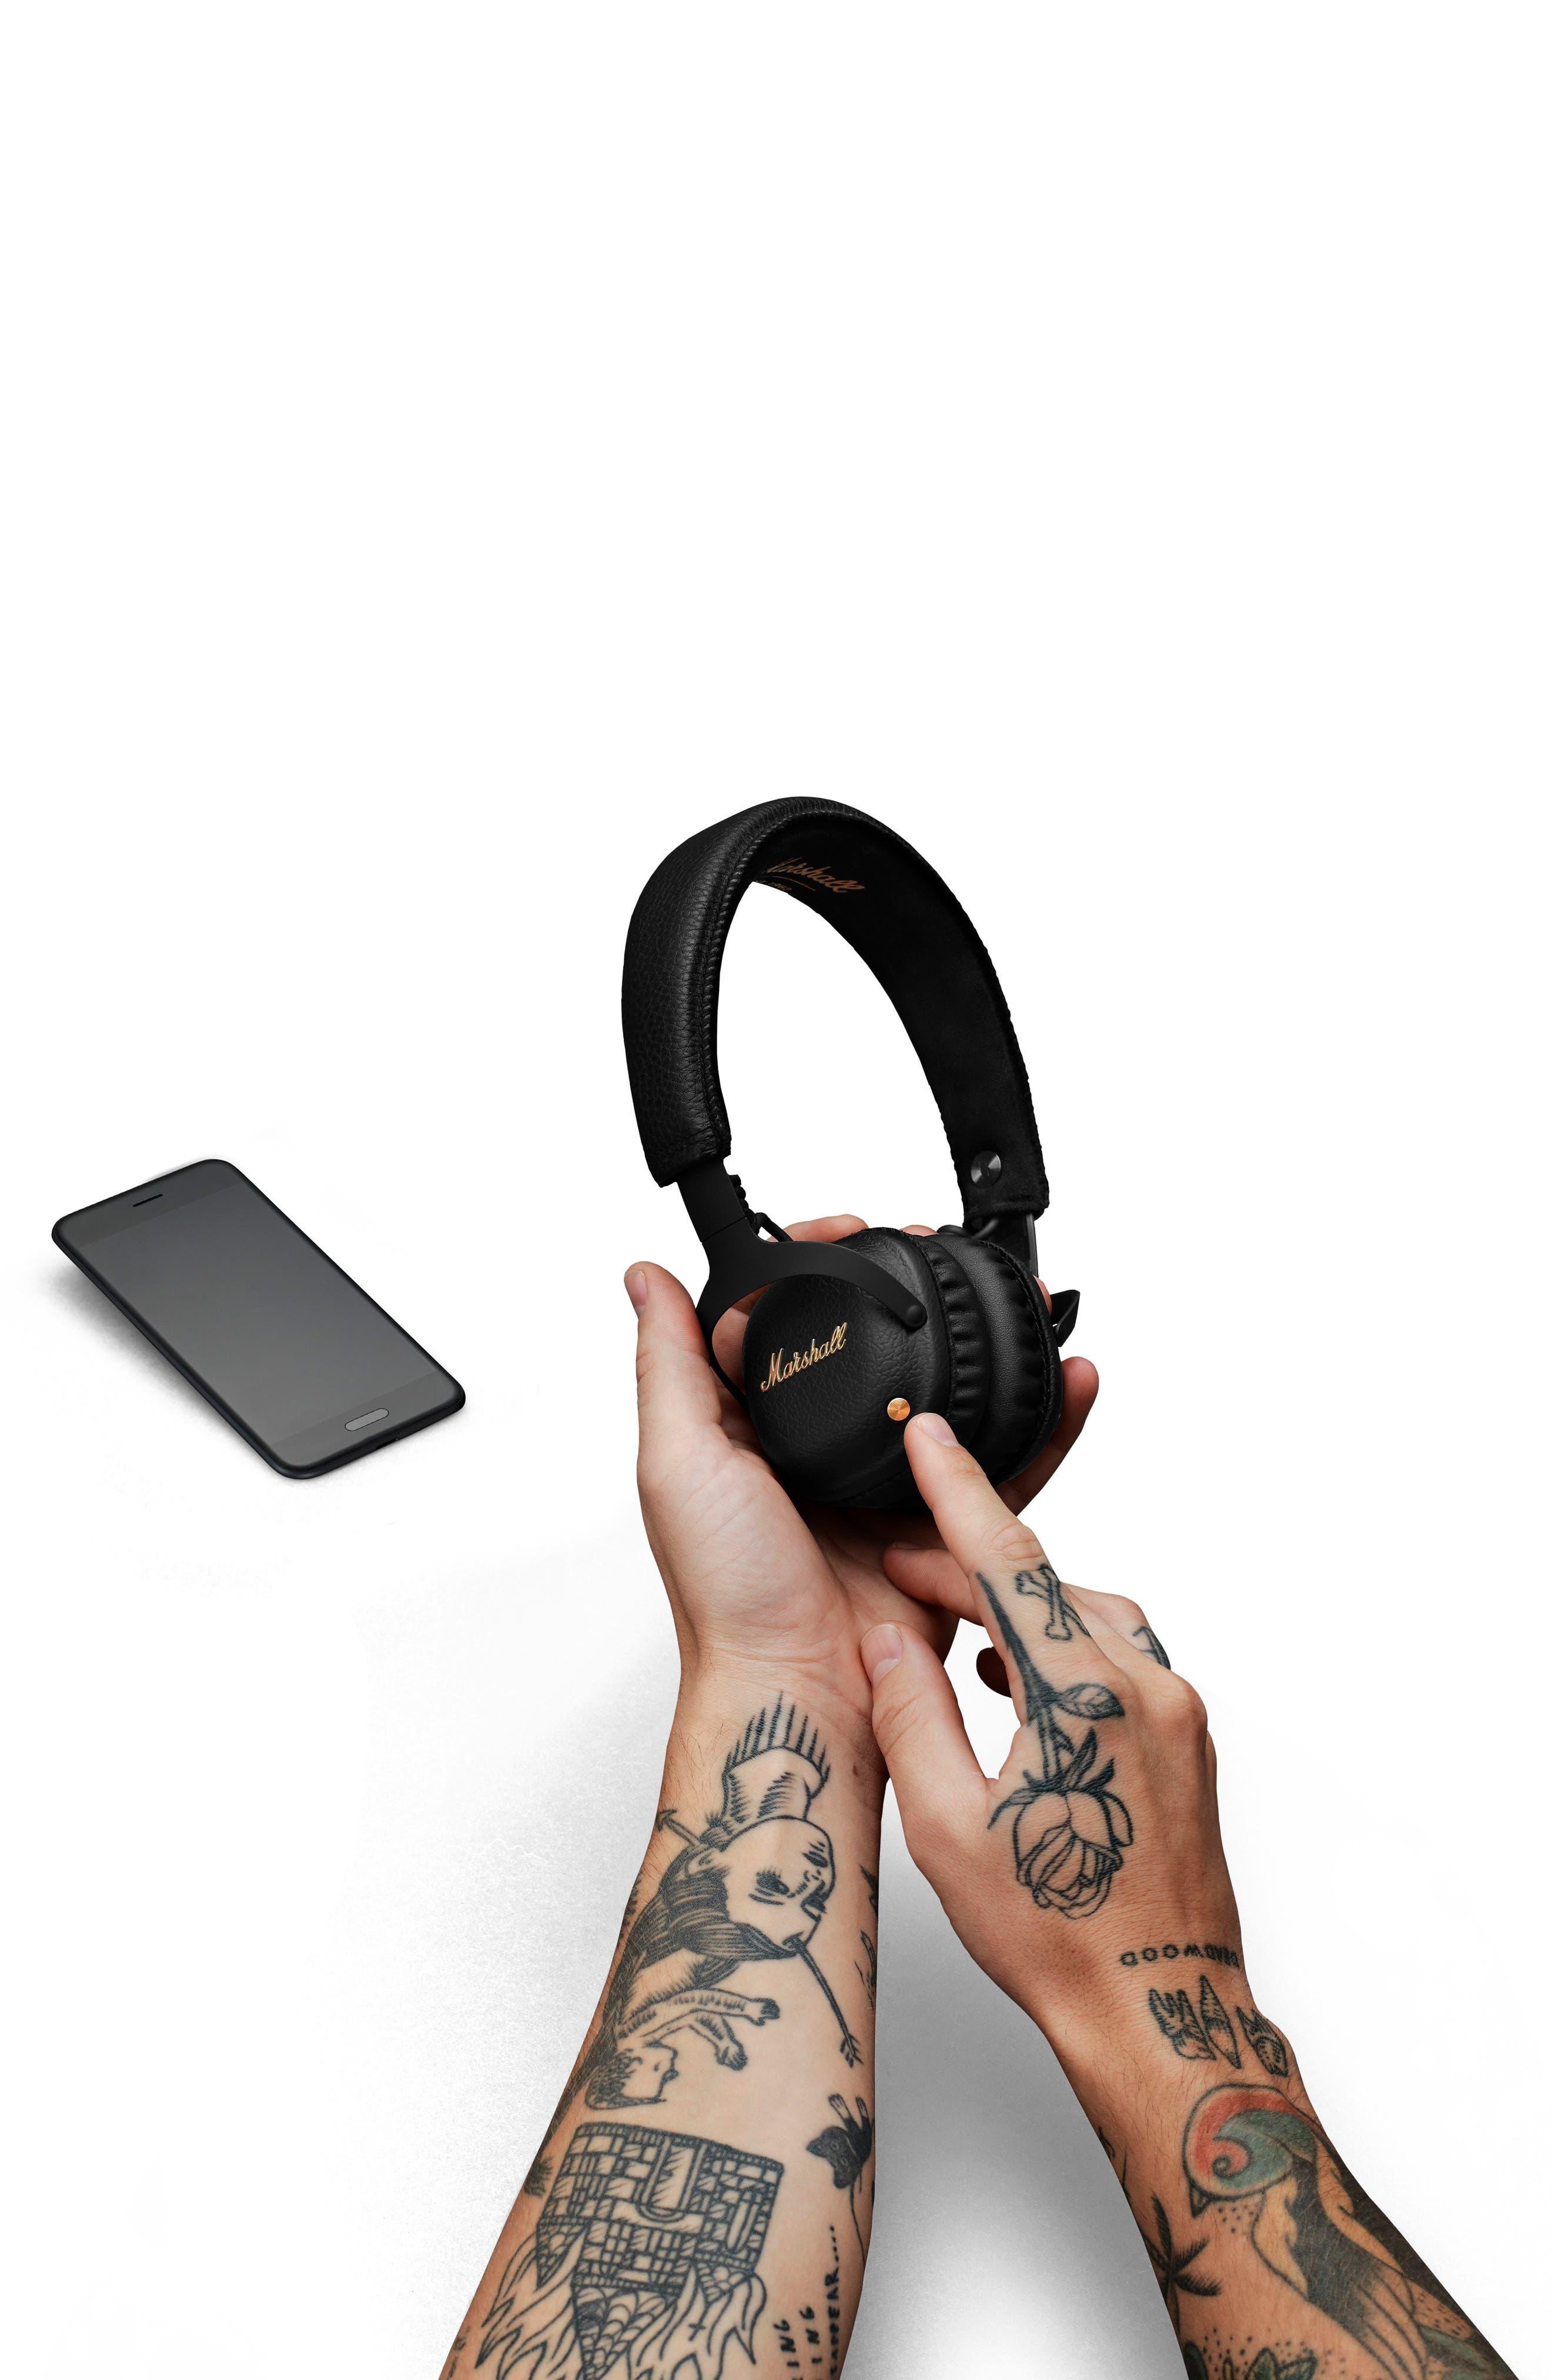 MID ANC Bluetooth<sup>®</sup> On-Ear Headphones,                             Alternate thumbnail 10, color,                             BLACK